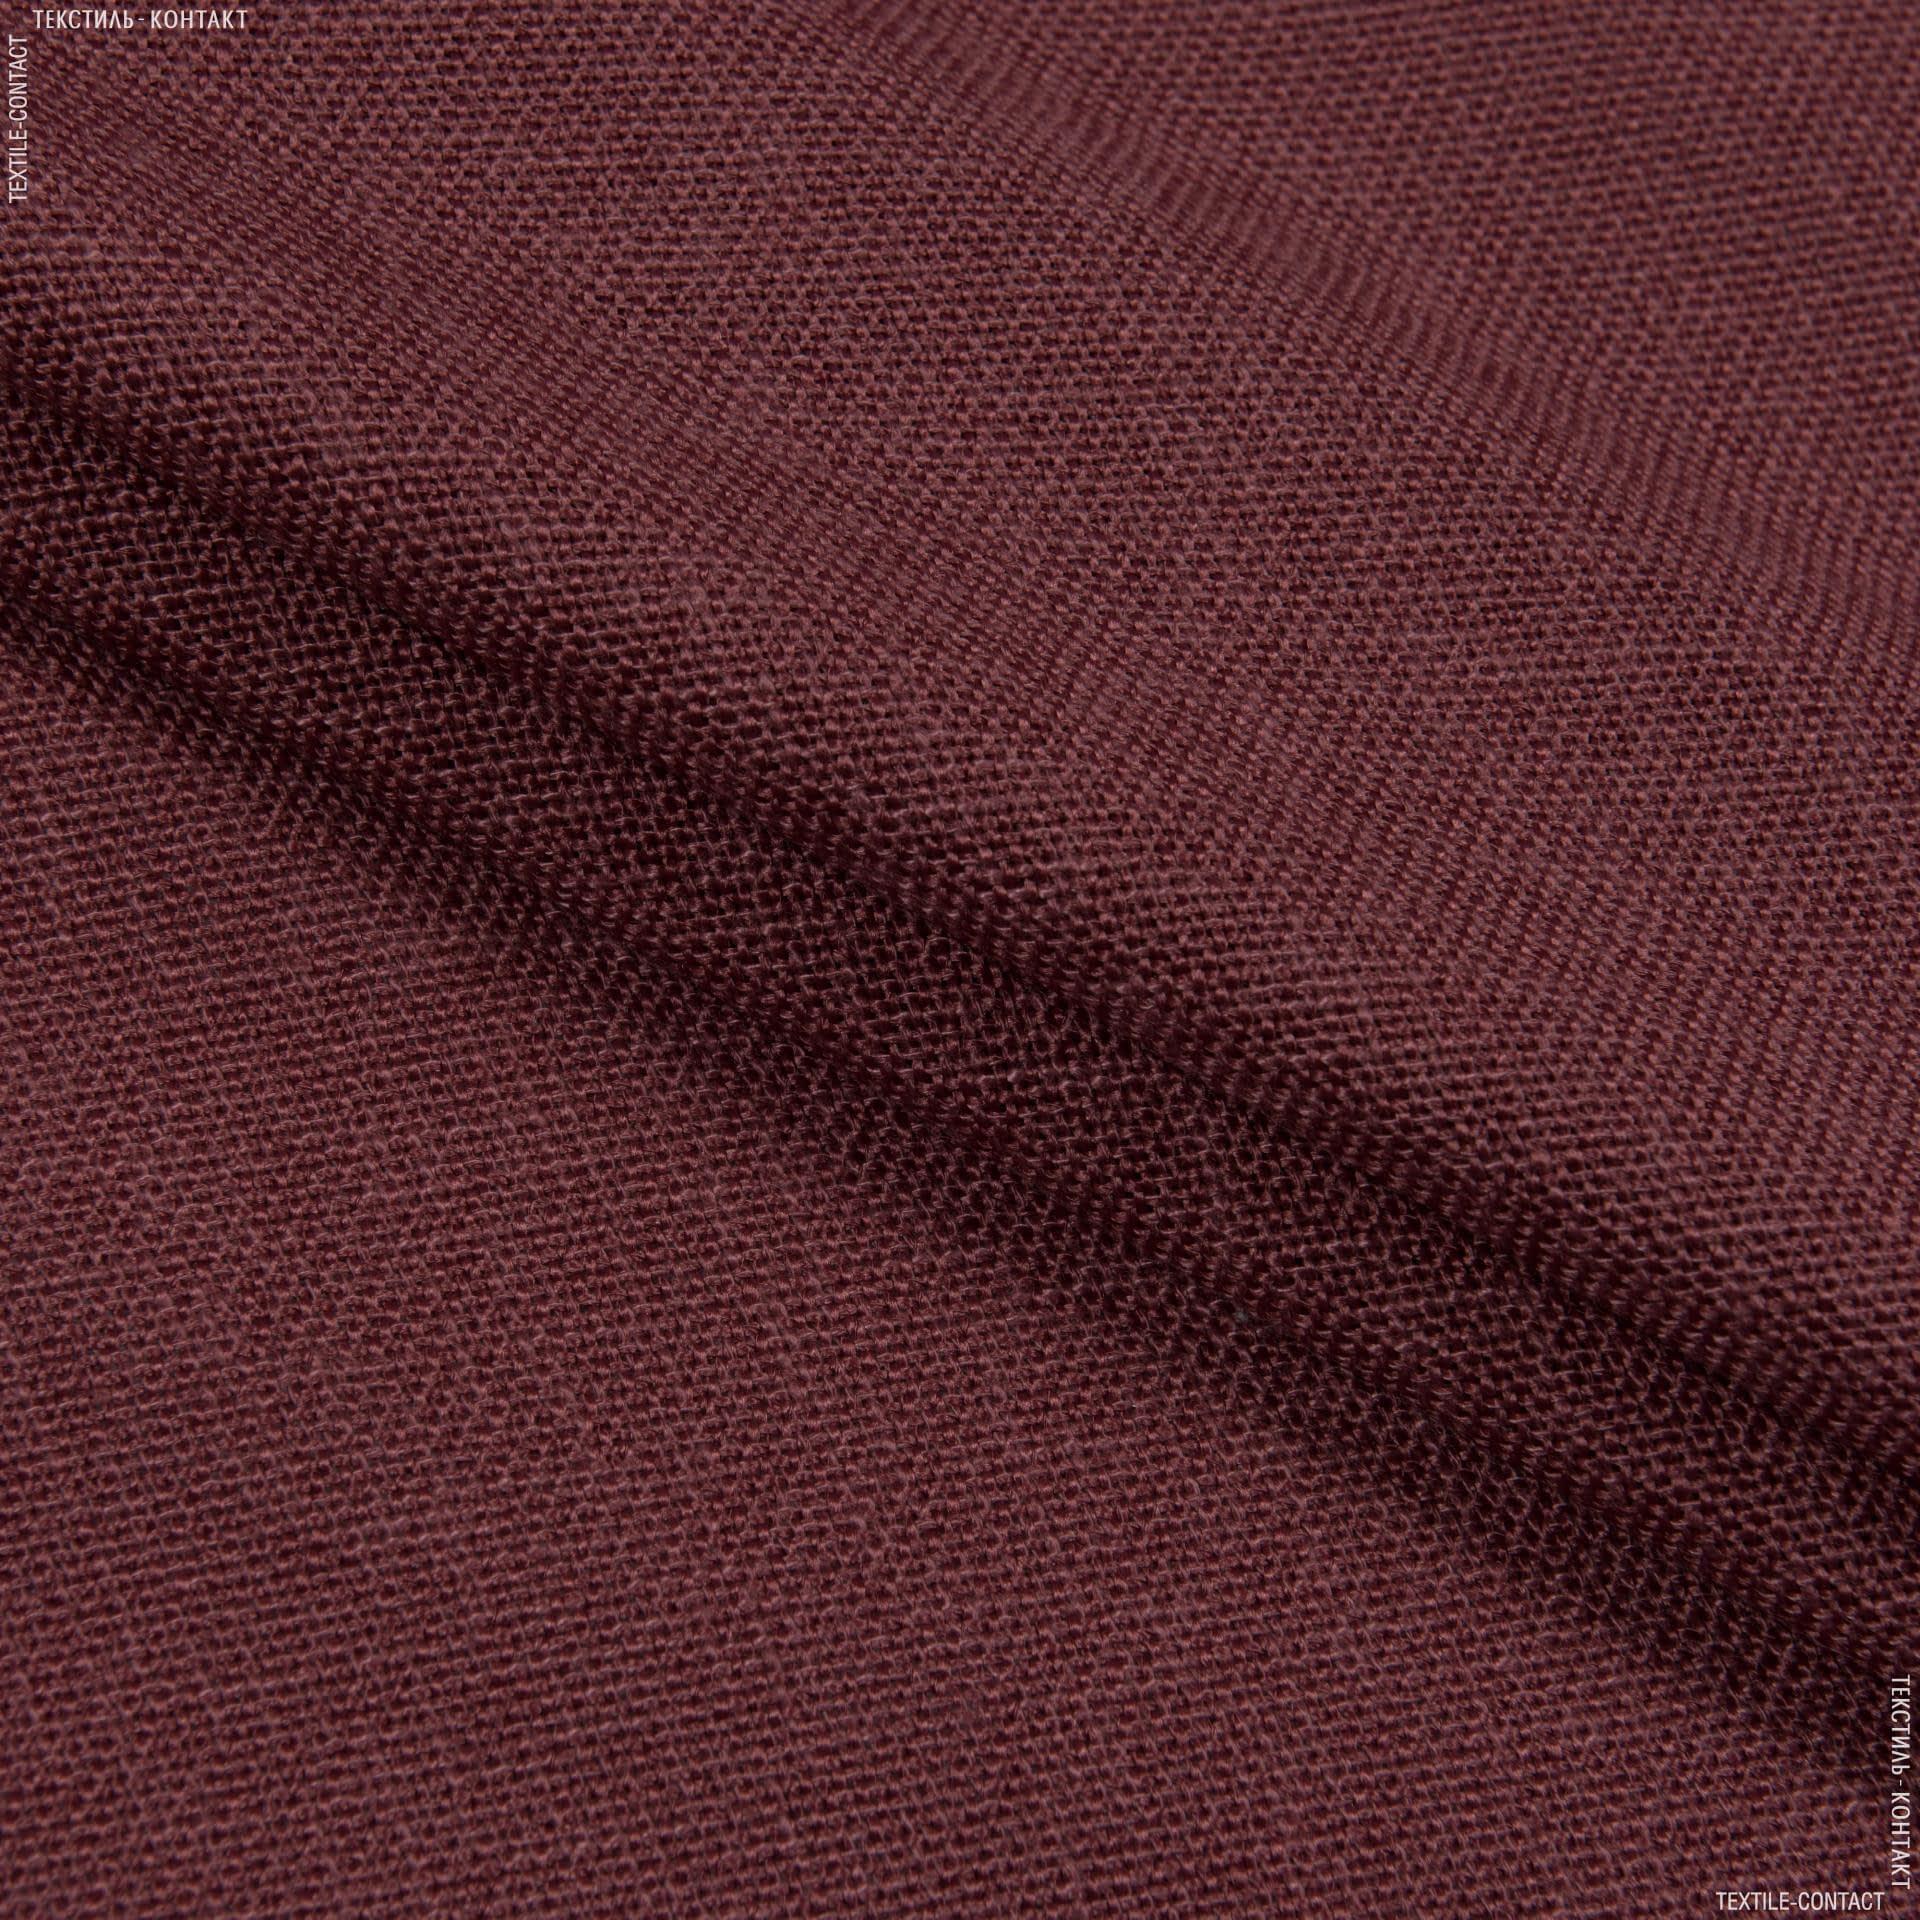 Ткани horeca - Декоративная ткань шархан /т.гранат